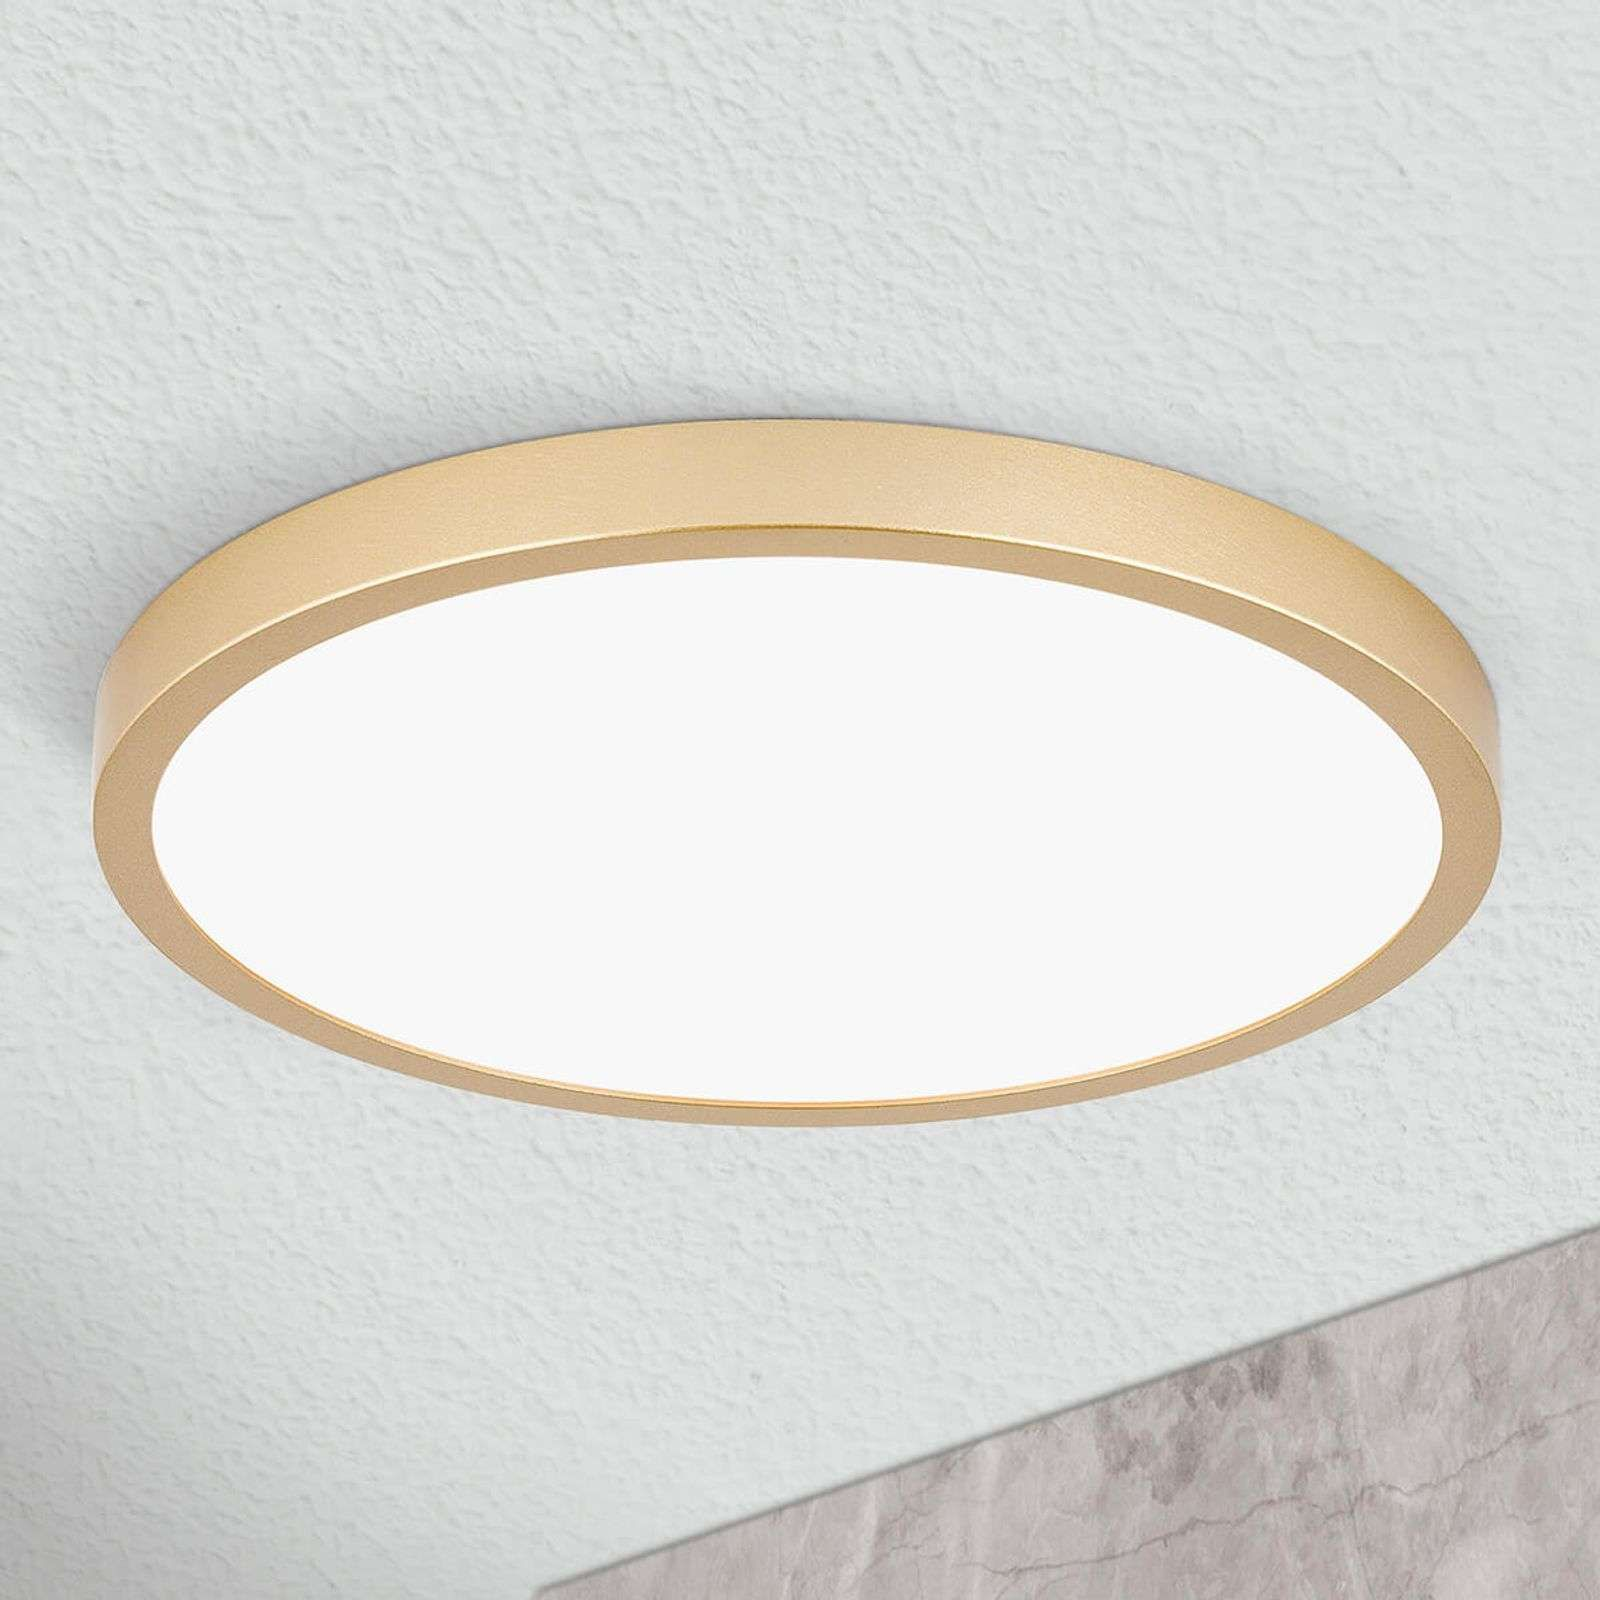 Ronde Led Plafondlamp Vika 30 Cm In 2020 Plafondlamp Verlichting Led